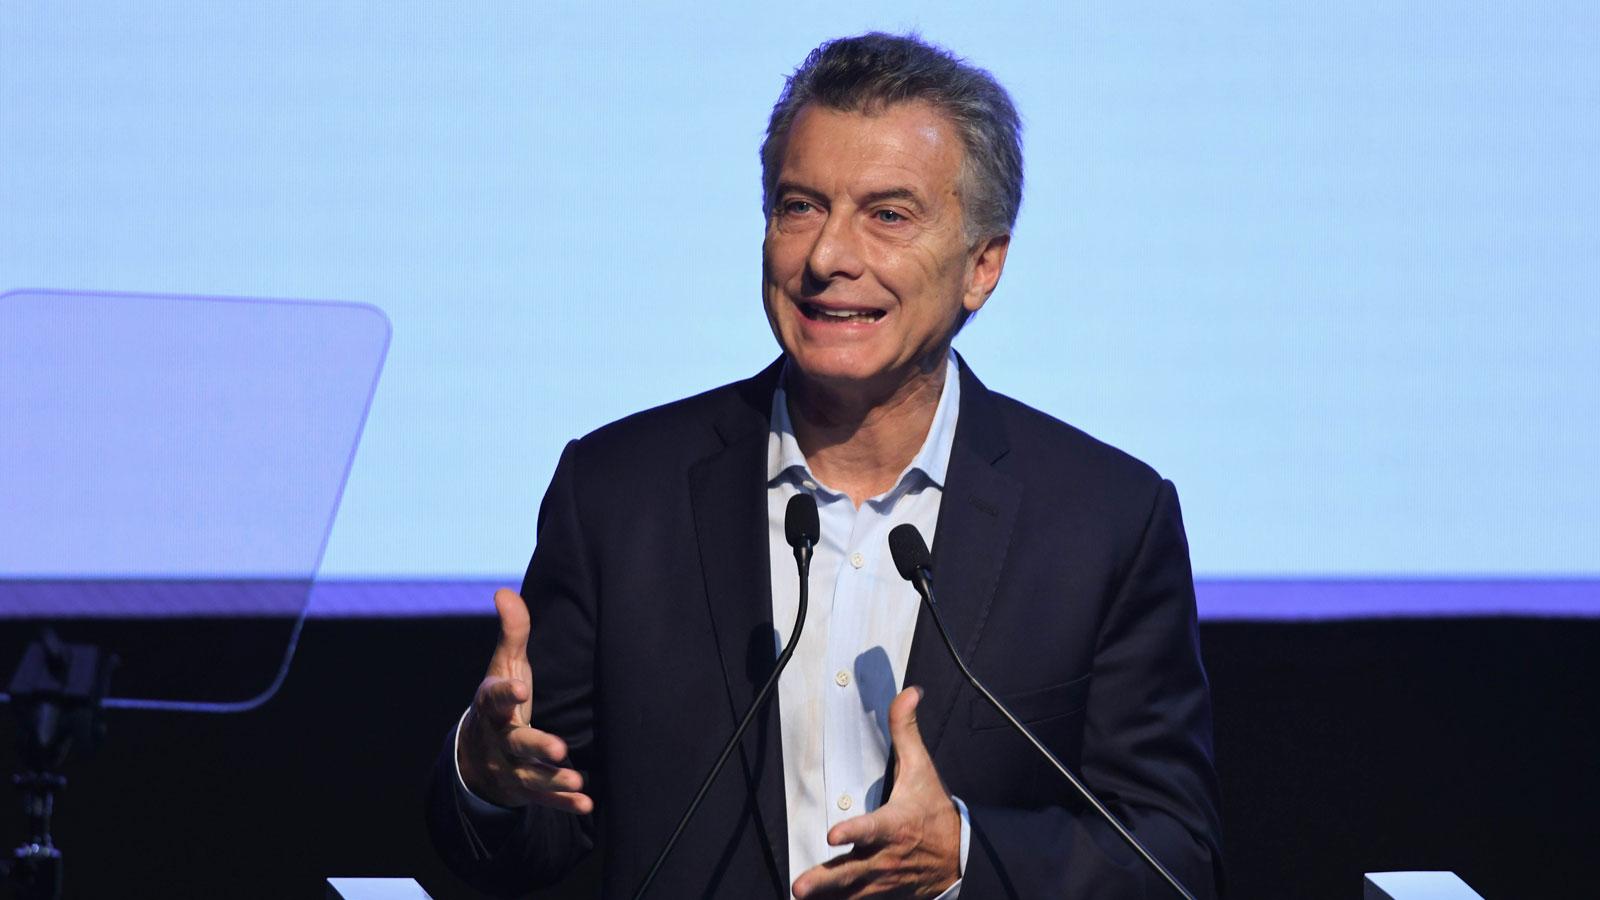 Macri encabezó un acto por el 50º aniversario del Indec (Foto de Télam)